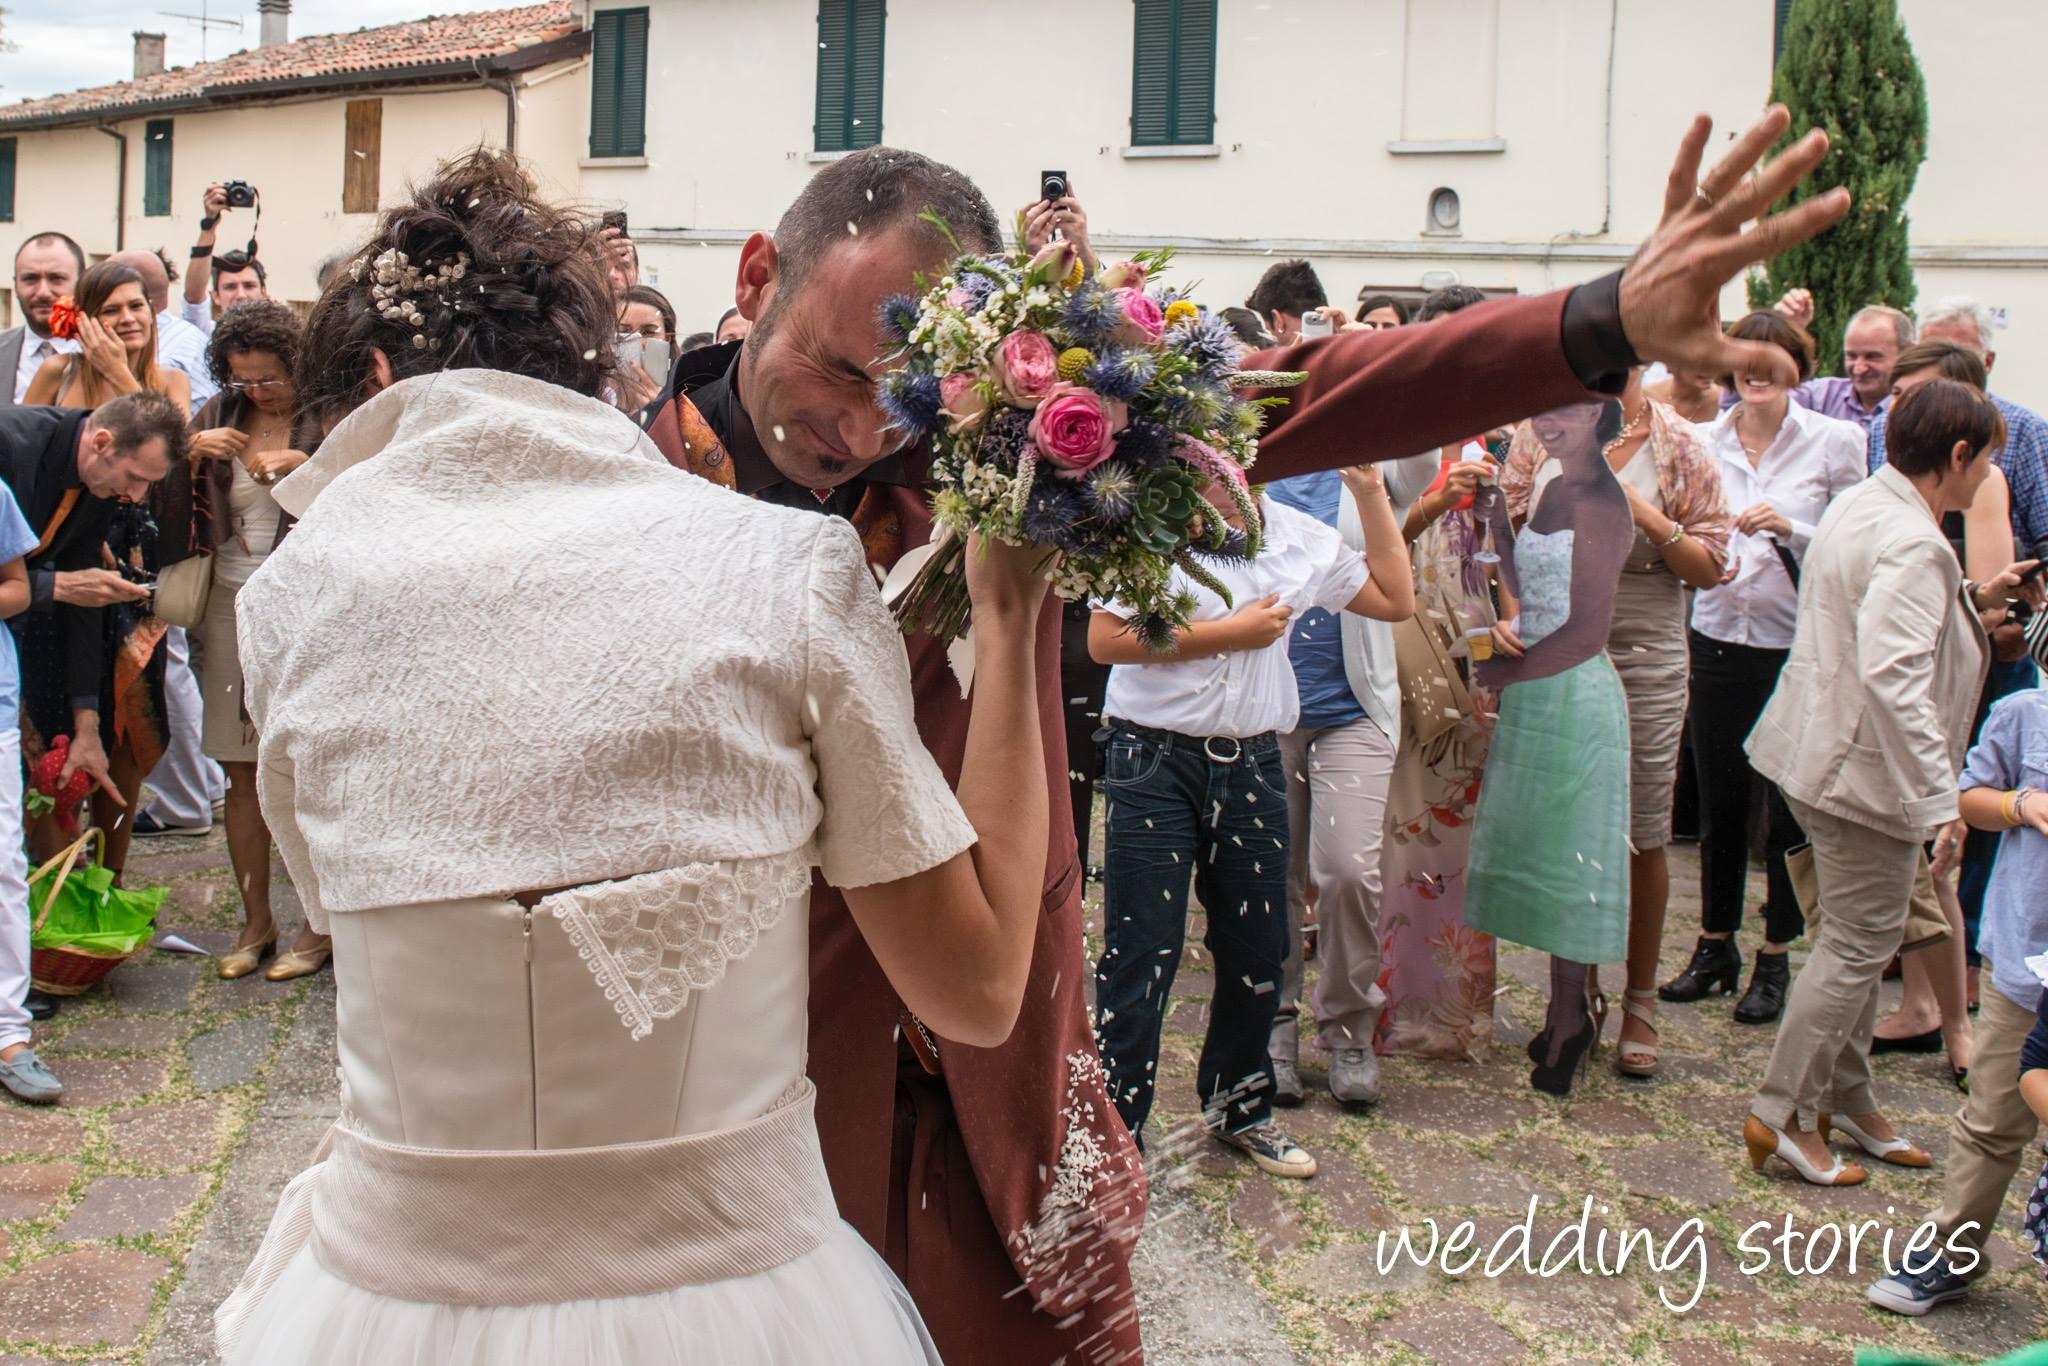 https://lnx.mirkone.it/wp-content/uploads/2015/07/mirk_ONE-fotografo-matrimonio-00866.jpg